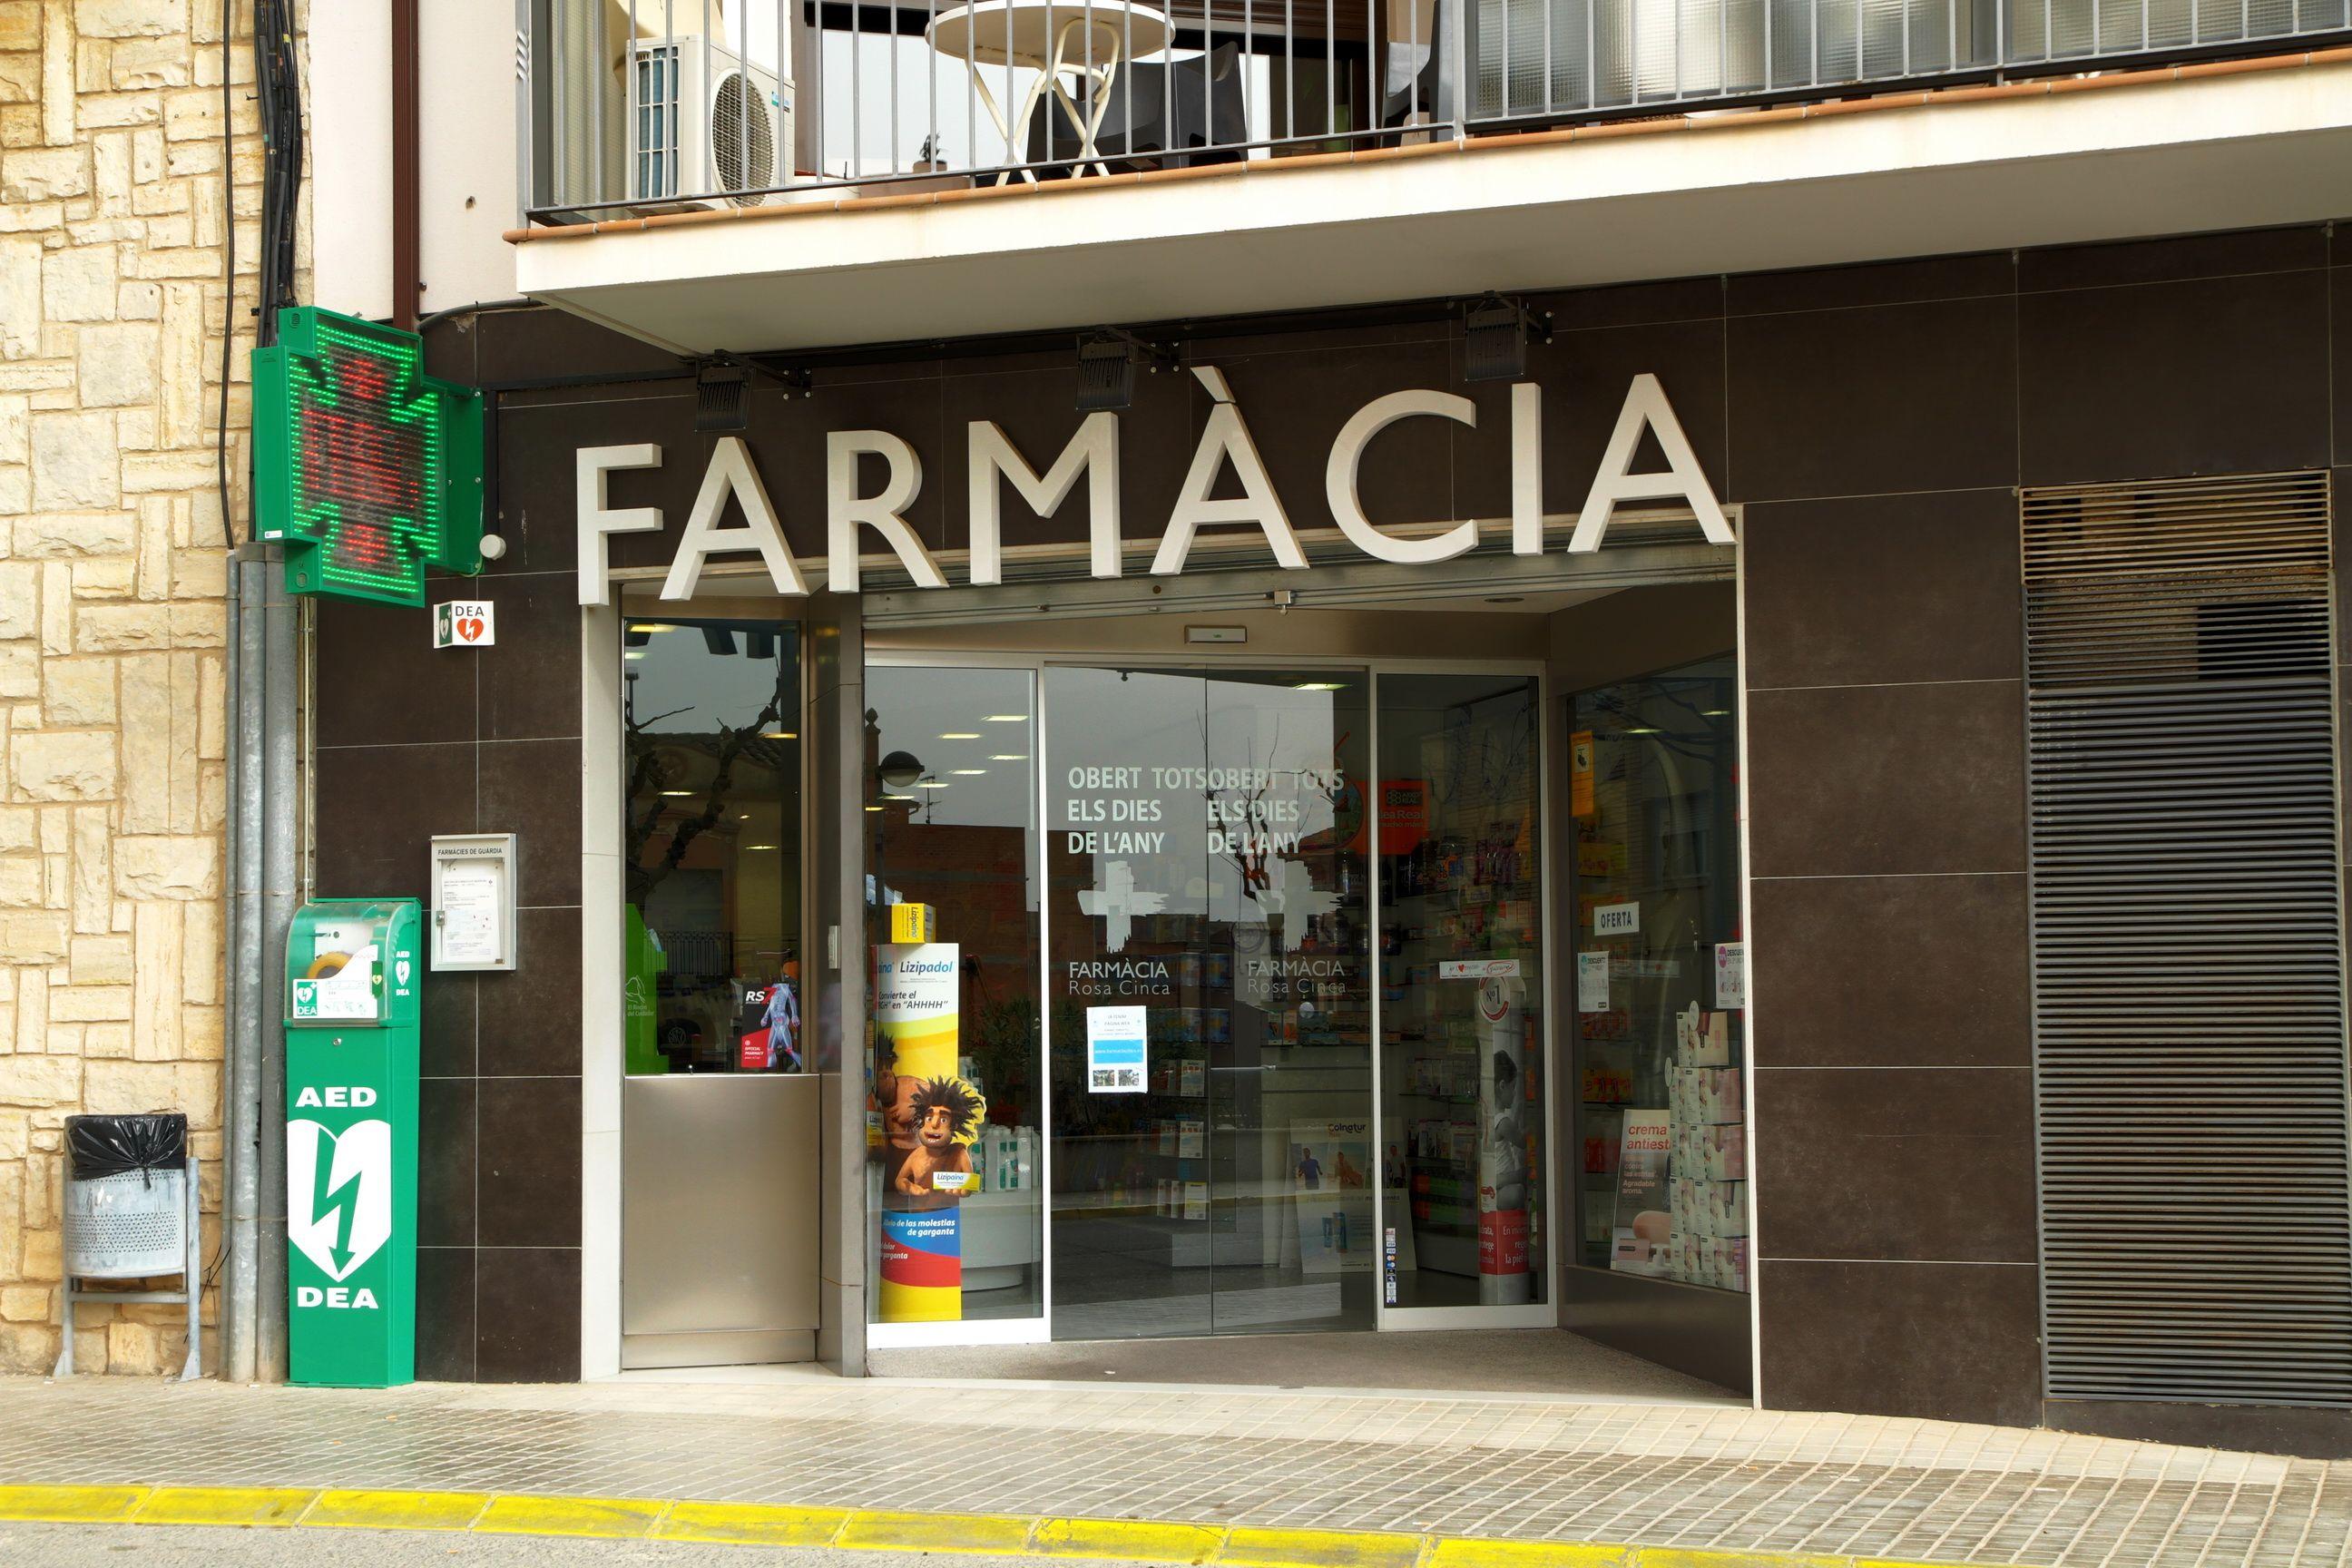 Foto 6 de Farmacia en Guissona | Farmacia Rosa Cinca